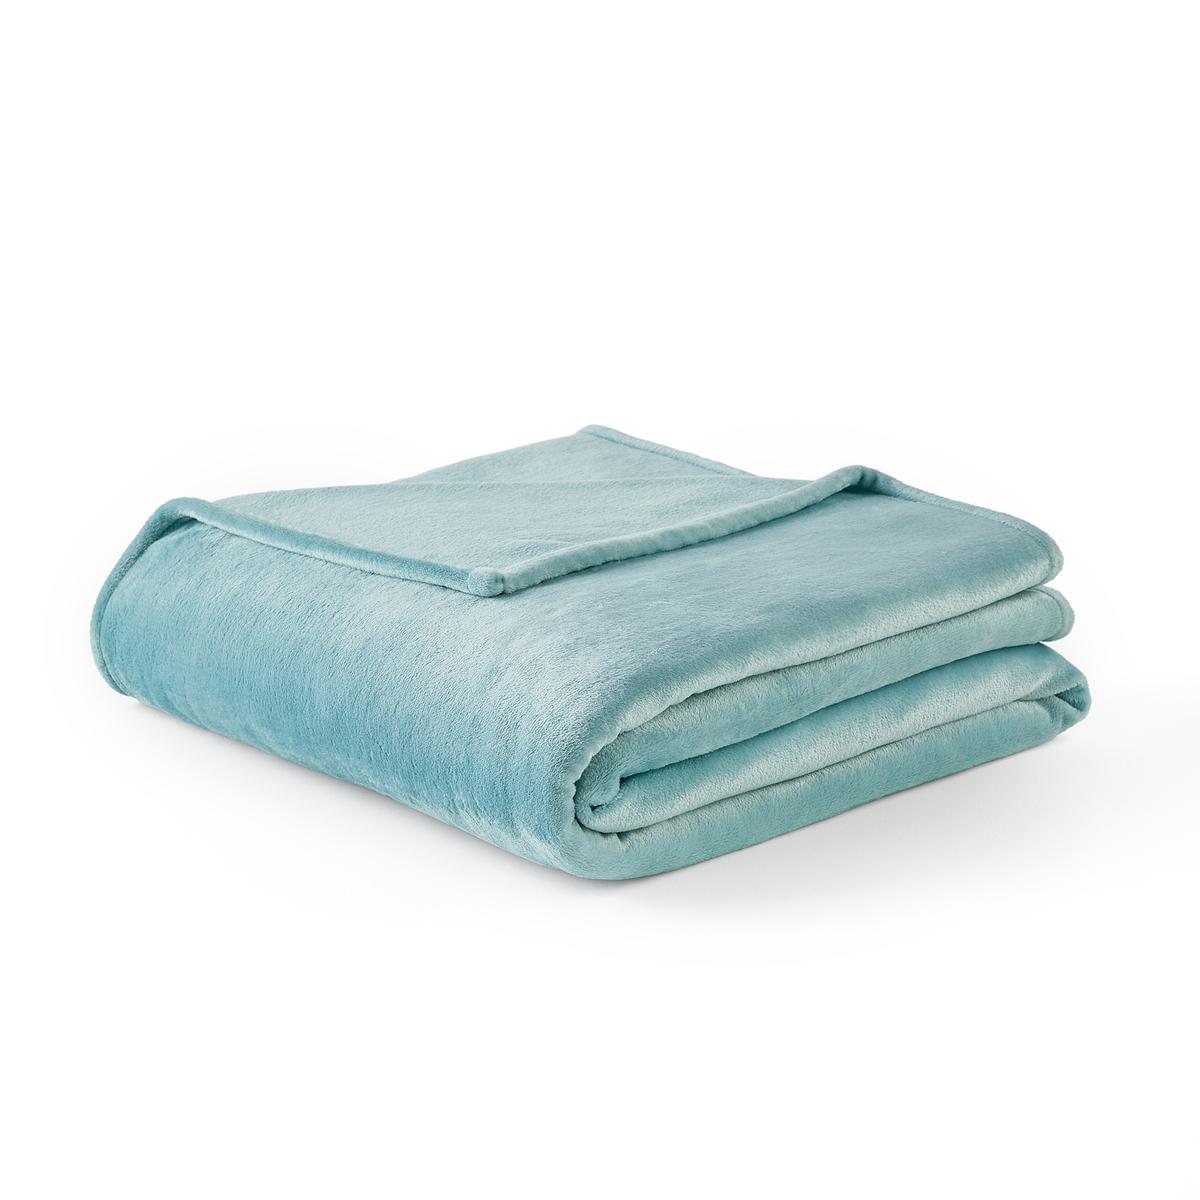 цена Одеяло La Redoute Из микрофибры Mild 240 x 220 см синий онлайн в 2017 году